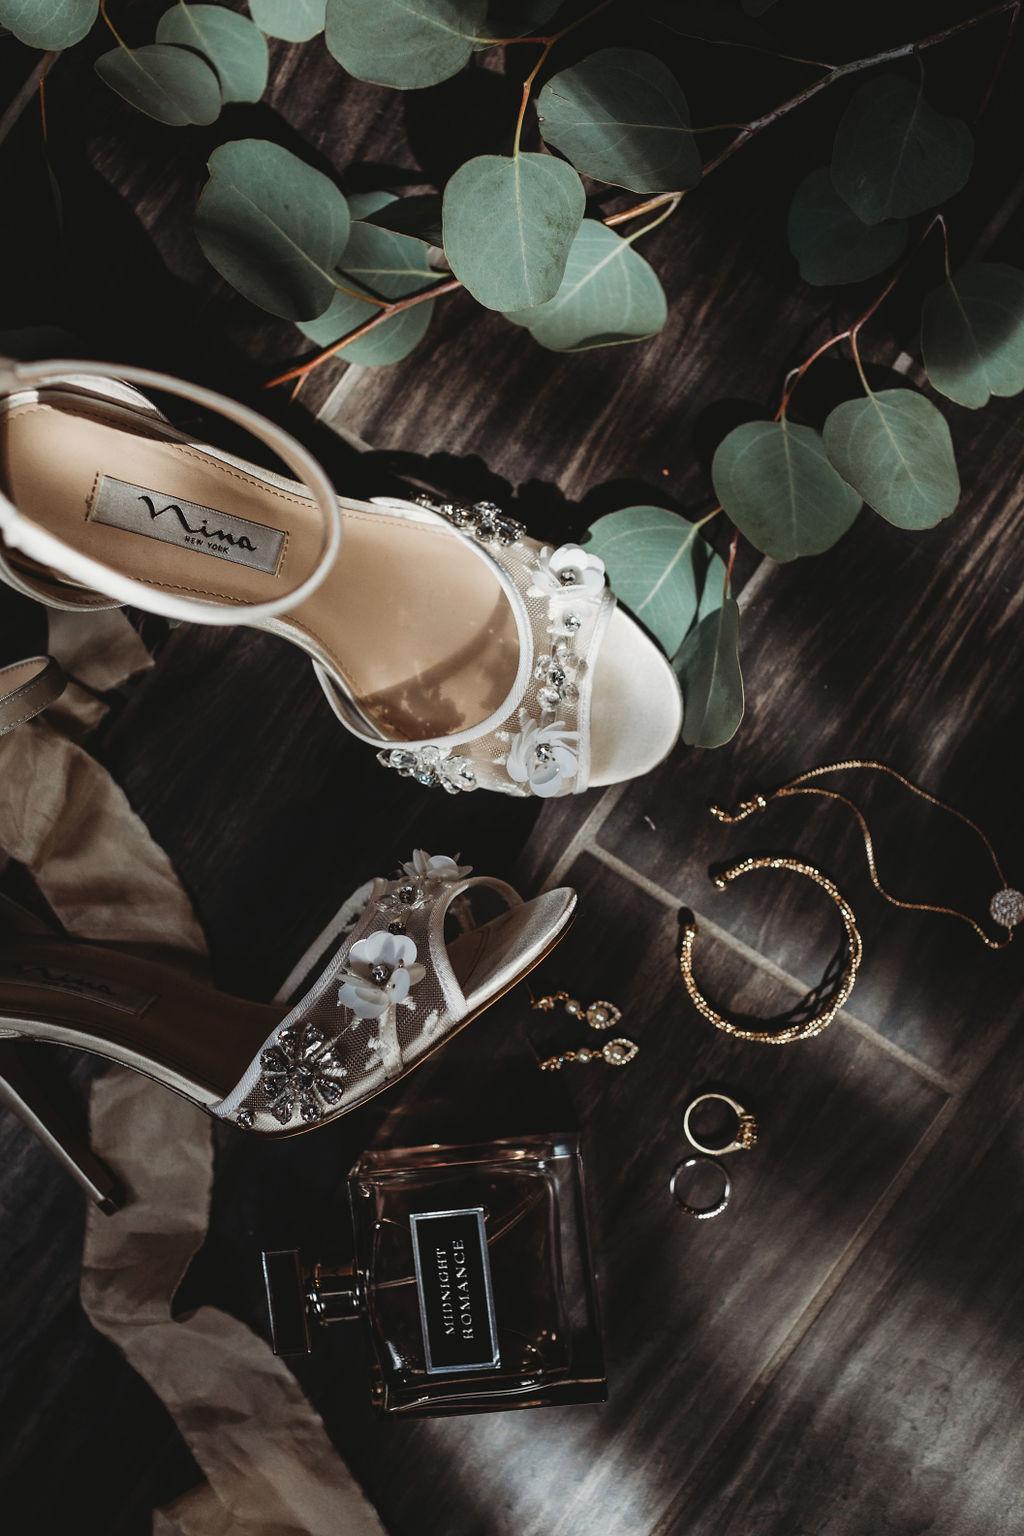 engle-olson-katie-dalton-wedding-clewell-photography-16.jpg